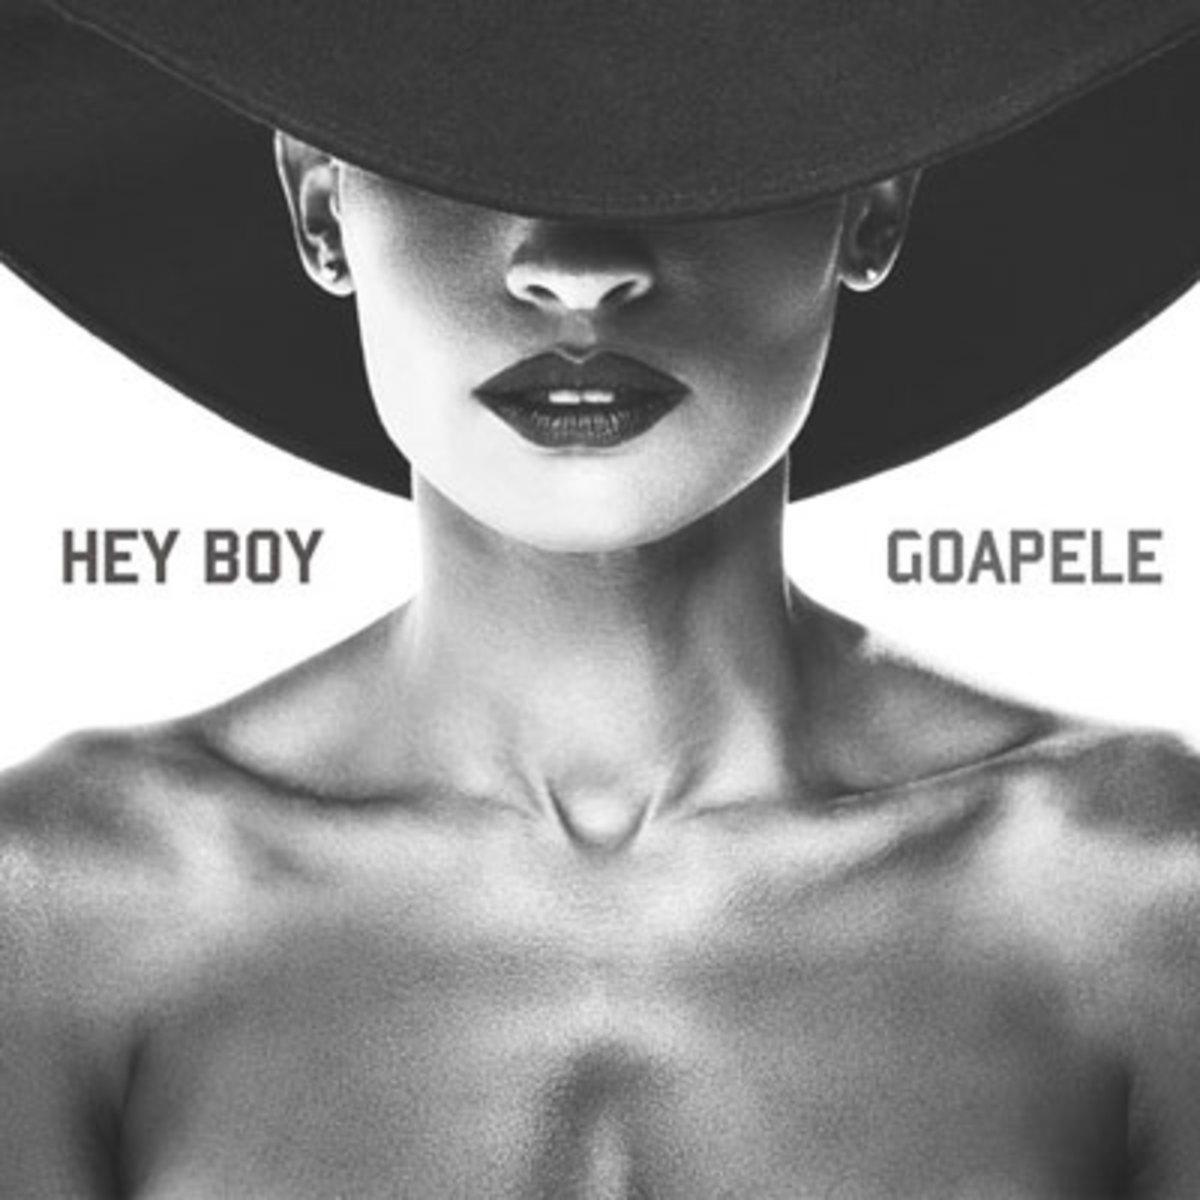 goapele-heyboy.jpg